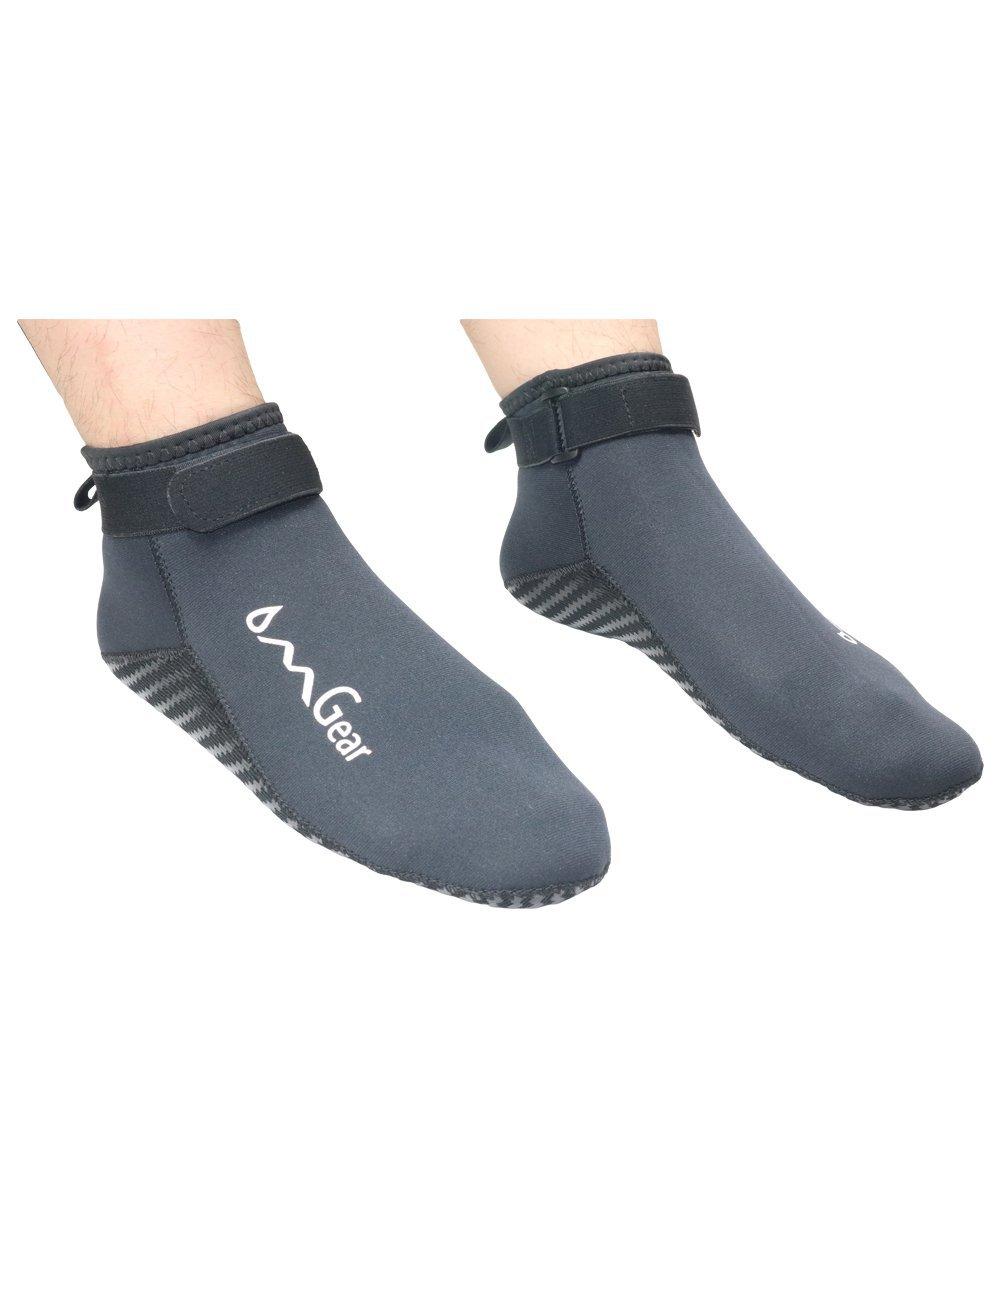 b7a5efb3fdc1 Get Quotations · Water Socks Neoprene Beach Socks Booties Shoes 3mm Glued  Blind Stitched Premium Unisex Anti-slip